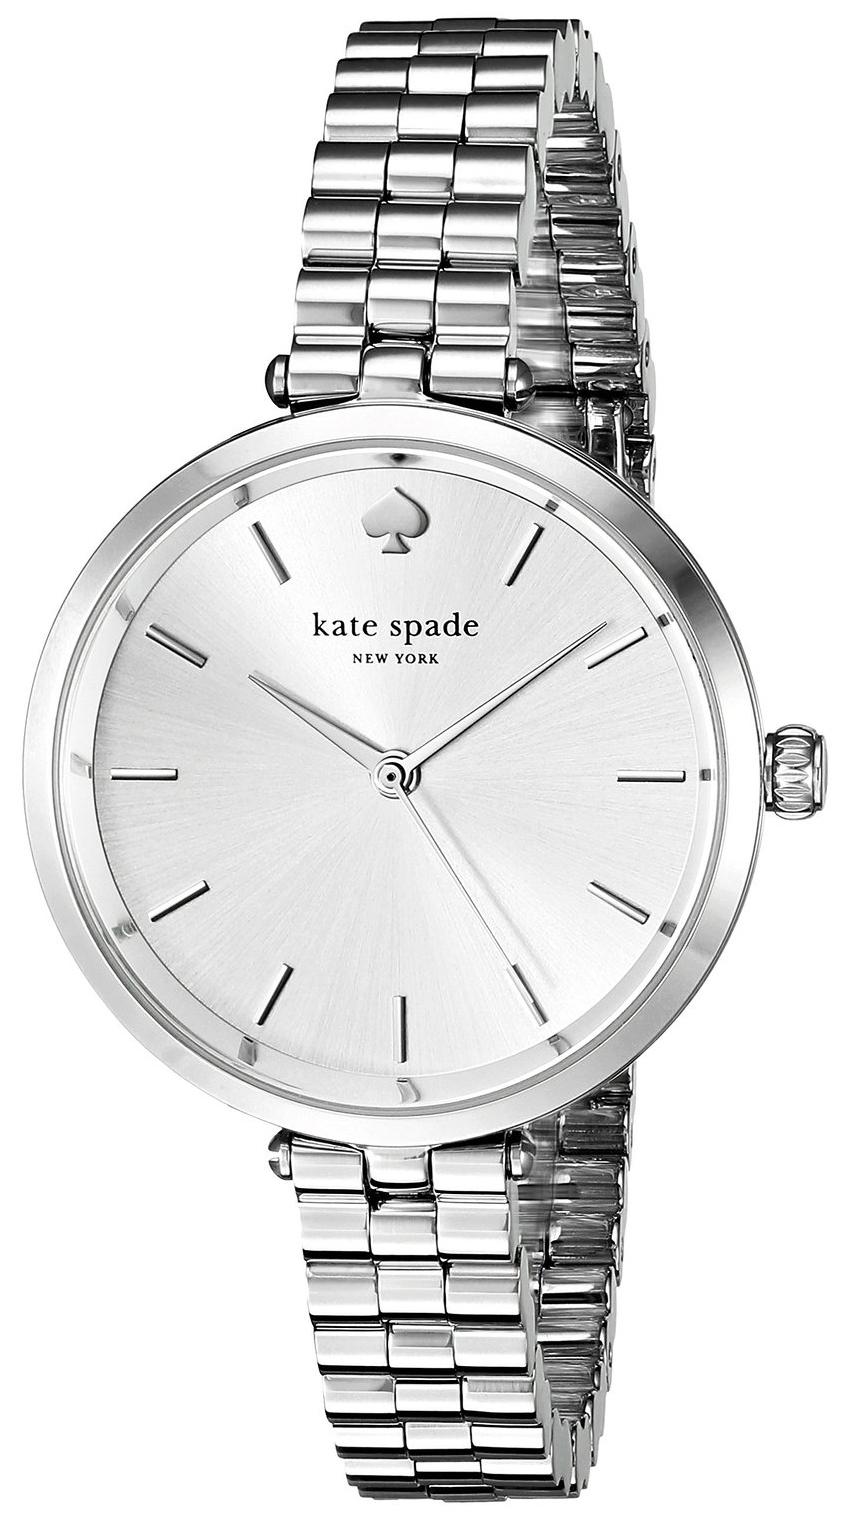 Kate Spade 99999 Dameklokke 1YRU0859 Sølvfarget/Stål Ø34 mm - Kate Spade